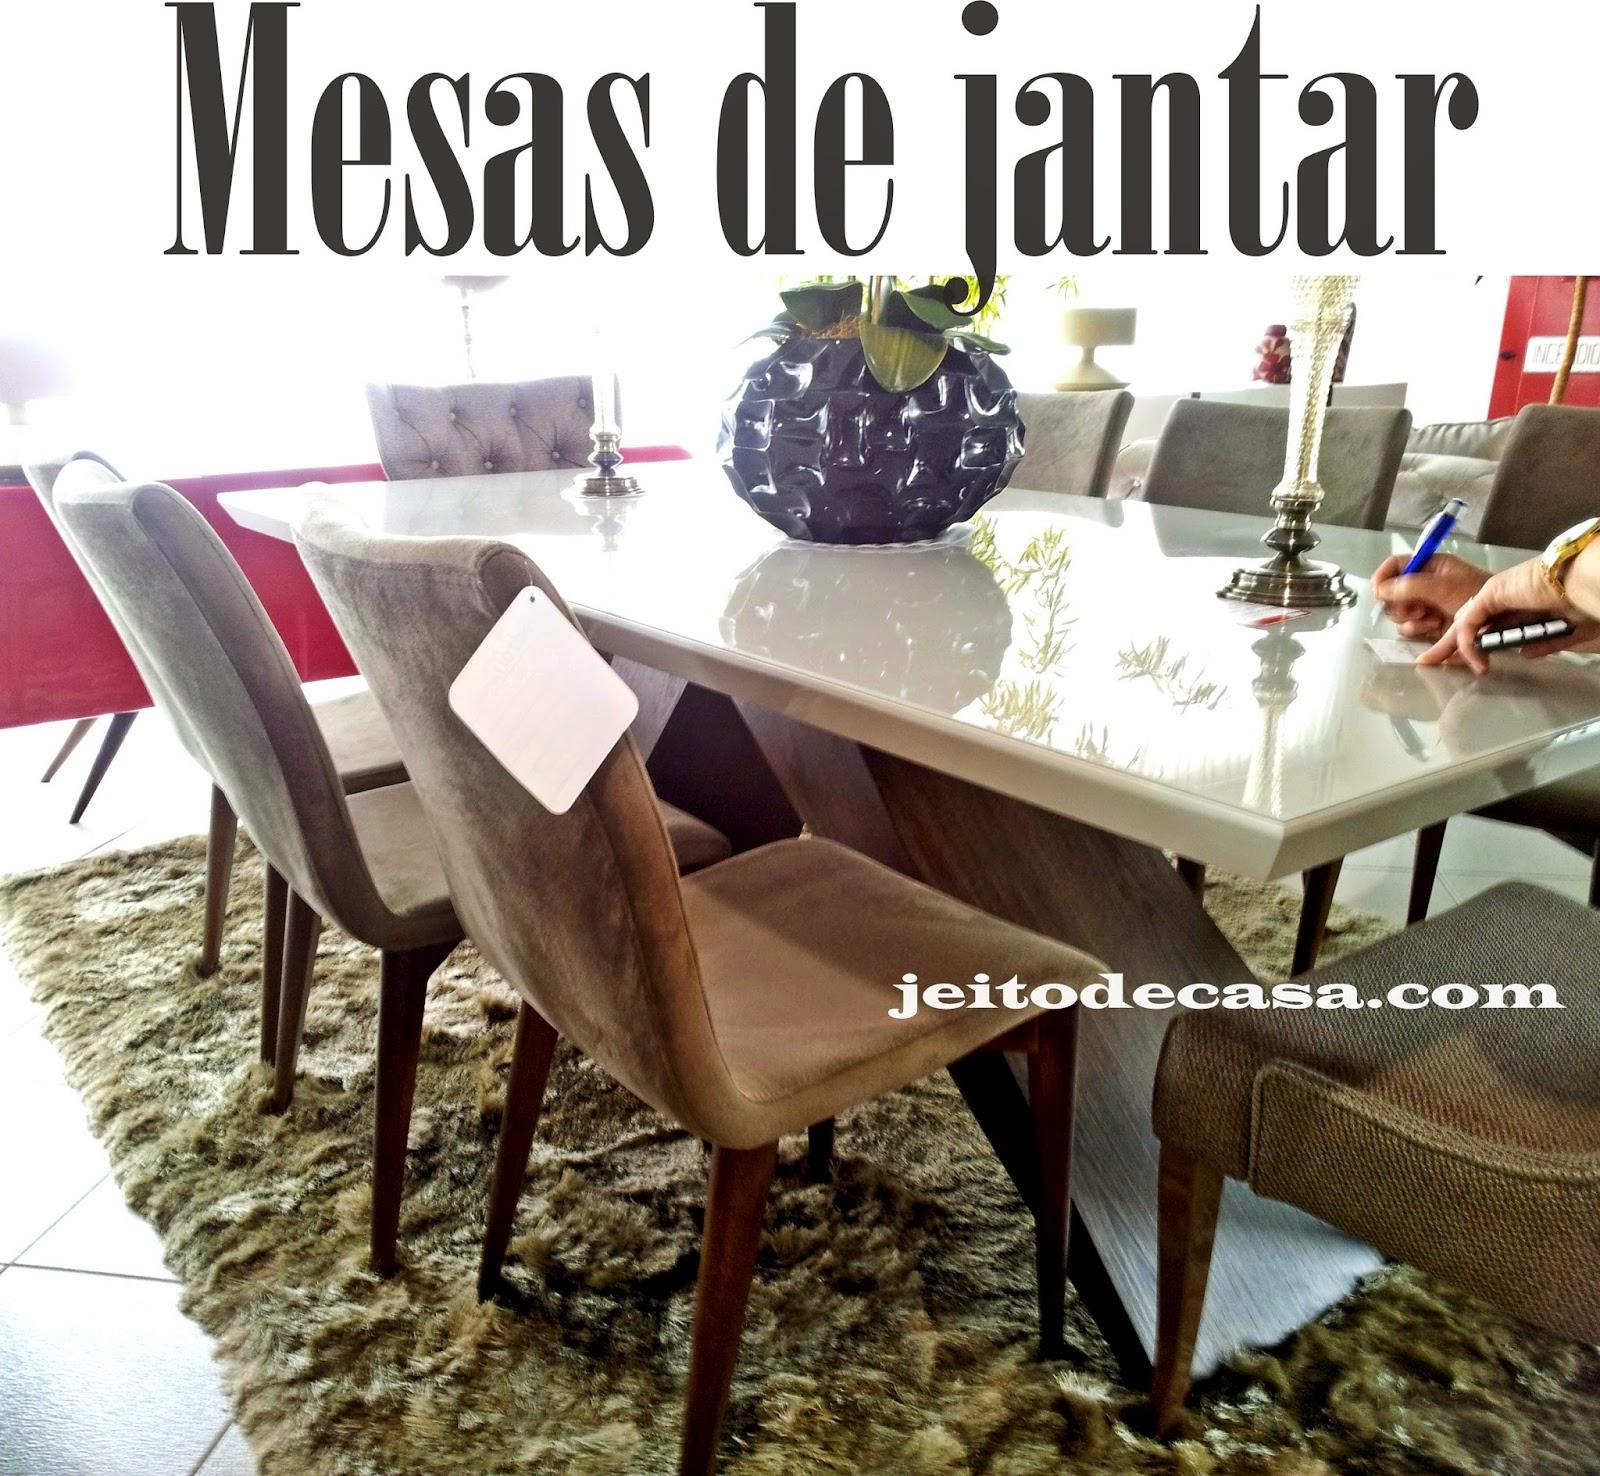 Mesas De Jantar Modelos Que Vi Por Aqui Jeito De Casa Blog De  -> Aparador Para Sala D Jantar Aki